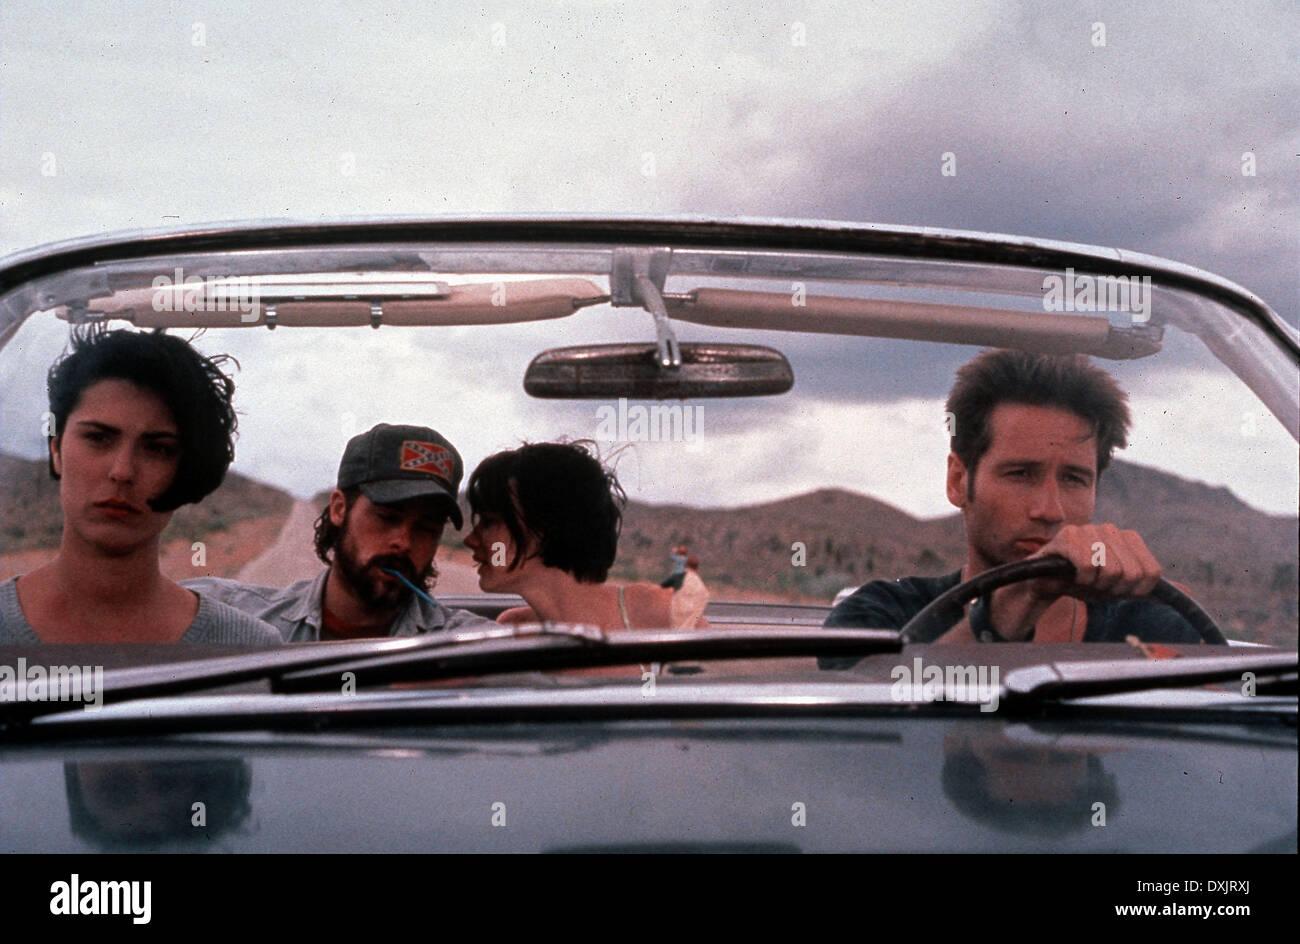 KALIFORNIA (US1993) MICHELLE FORBES, BRAD PITT, JULIETTE LEW - Stock Image